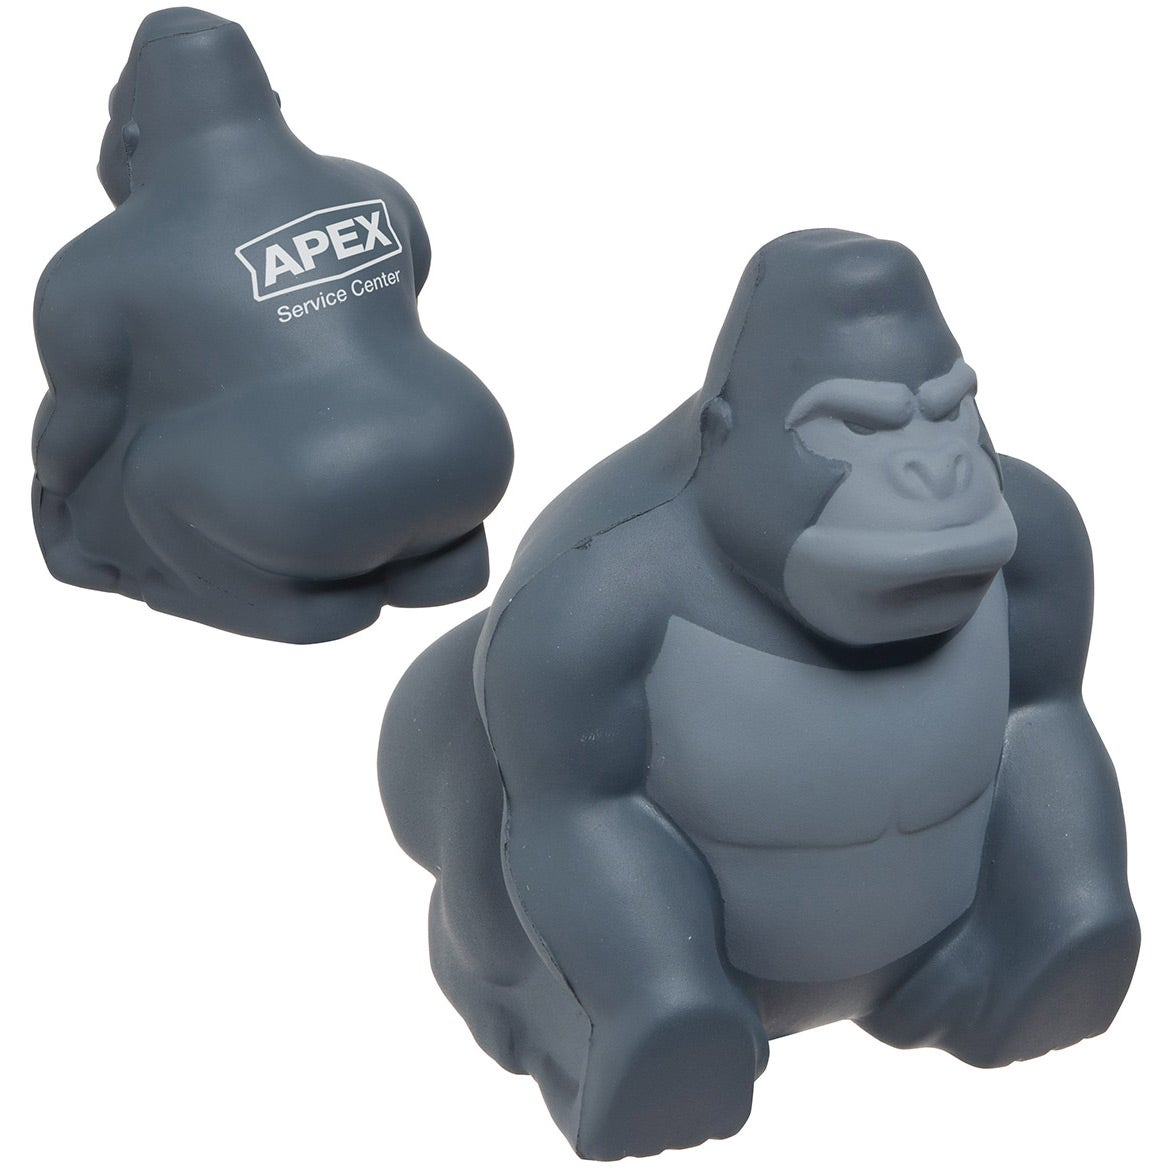 Gorilla Stress Balls